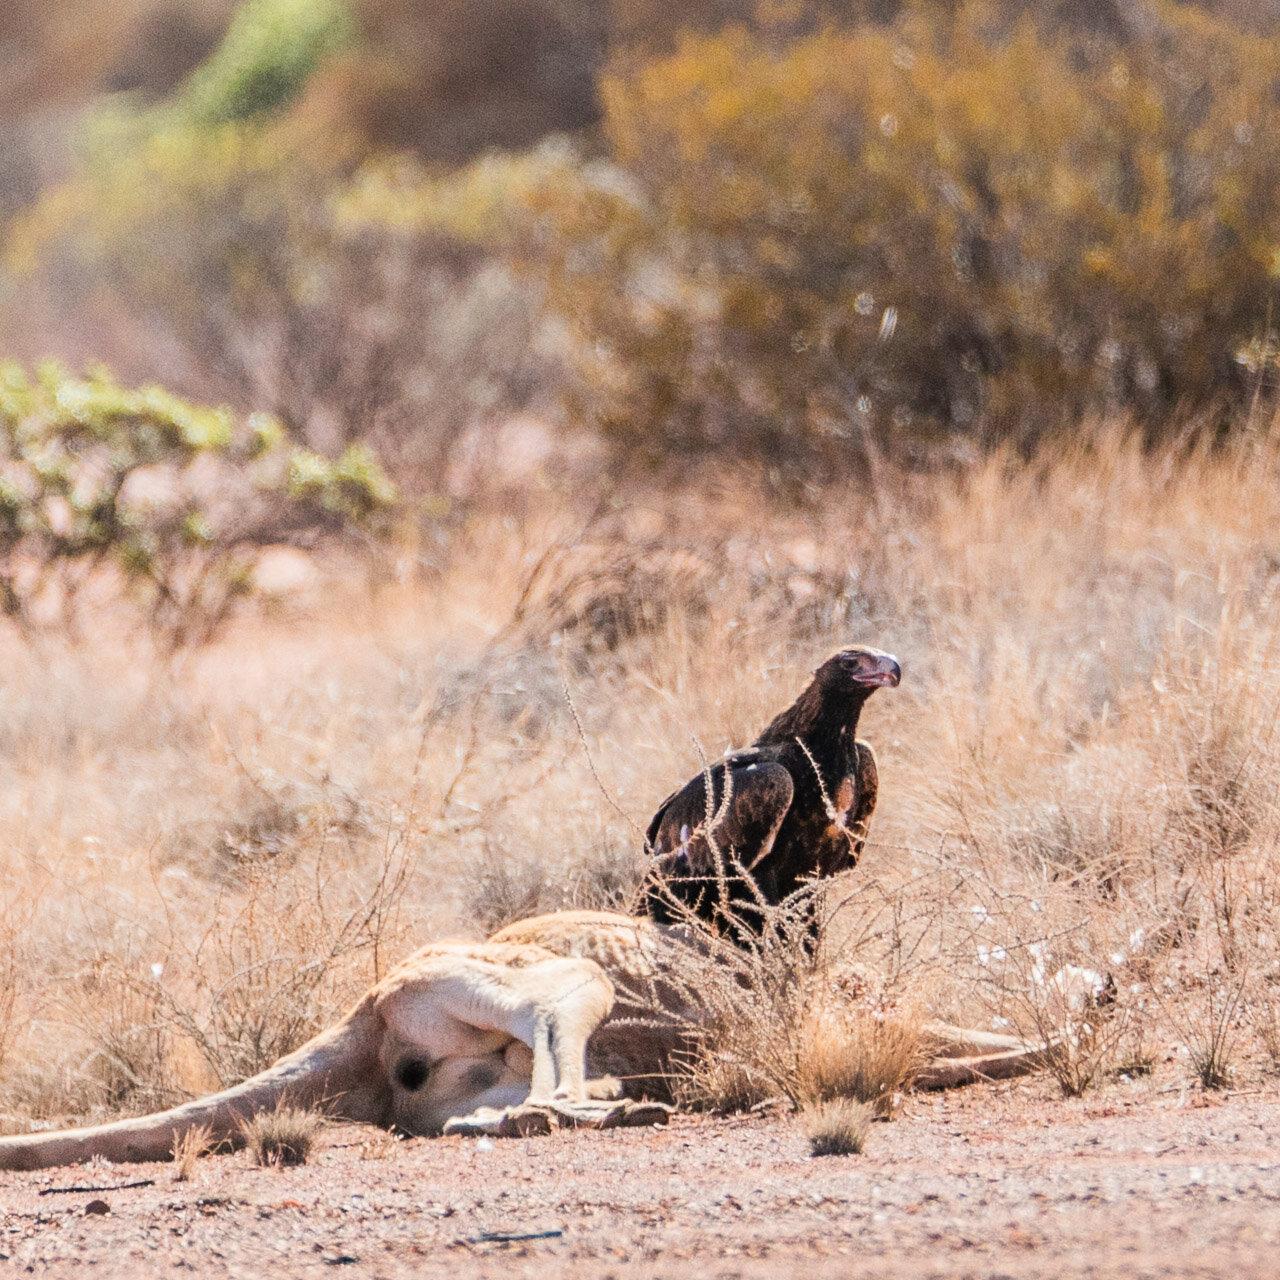 Roadkill - a wedgetail eagle with a dead kangaroo